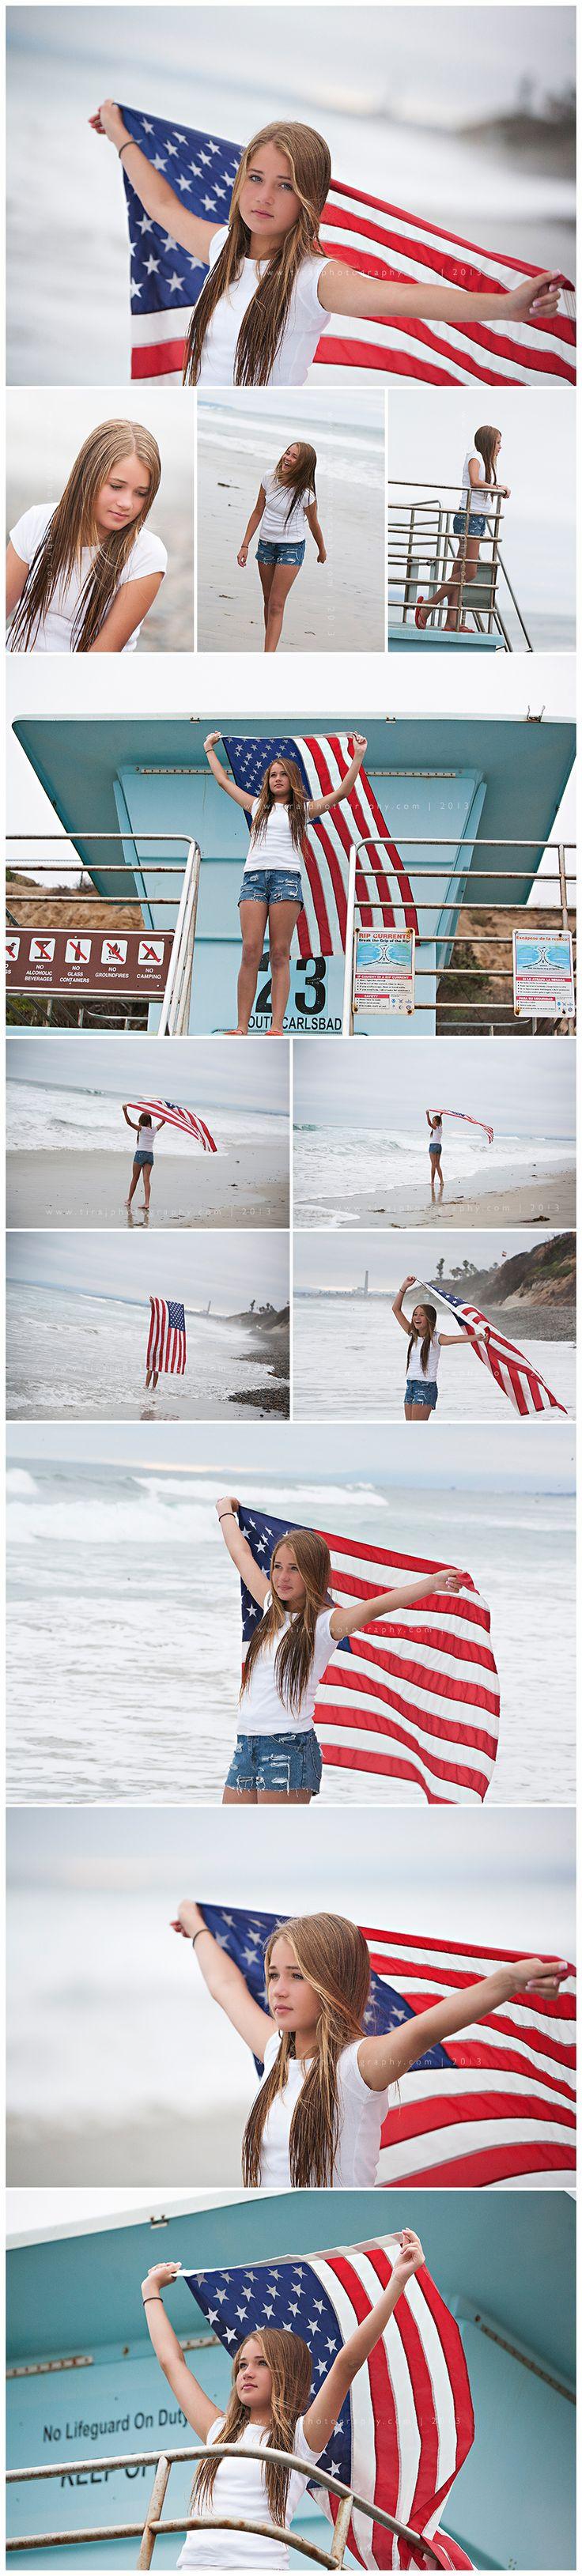 Southern California Teen Photographer | Teen Portraits at the Beach | Upland Teen Photographer | Tira J Photography